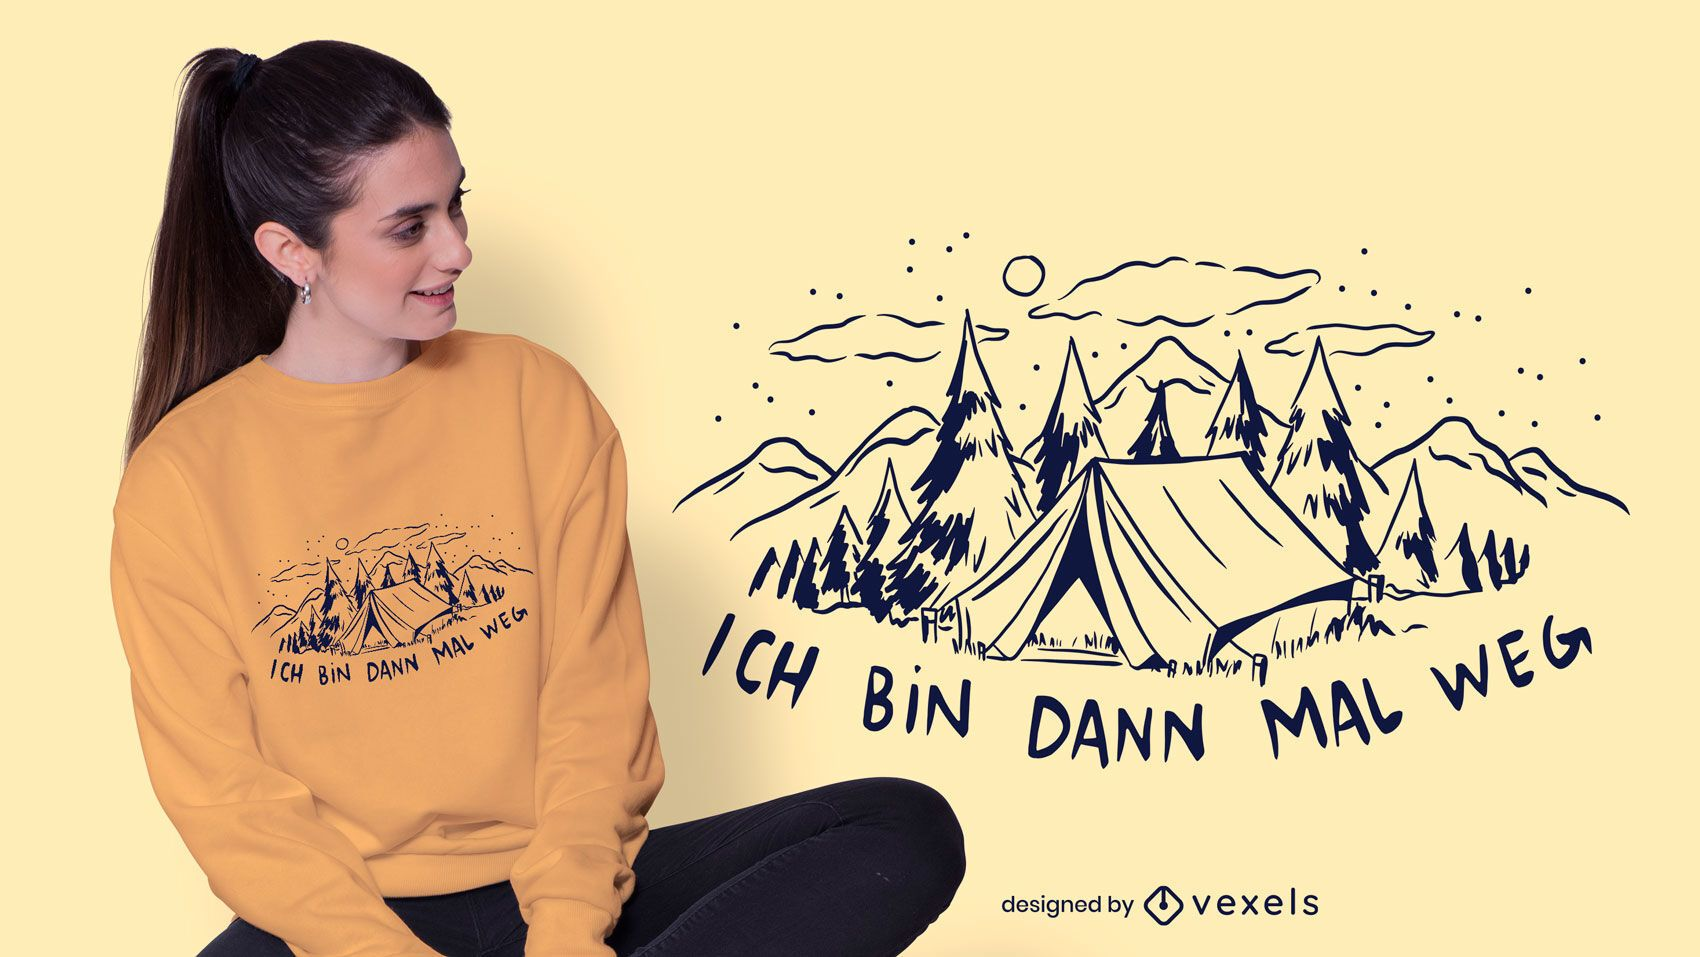 Dise?o de camiseta alemana de camping.